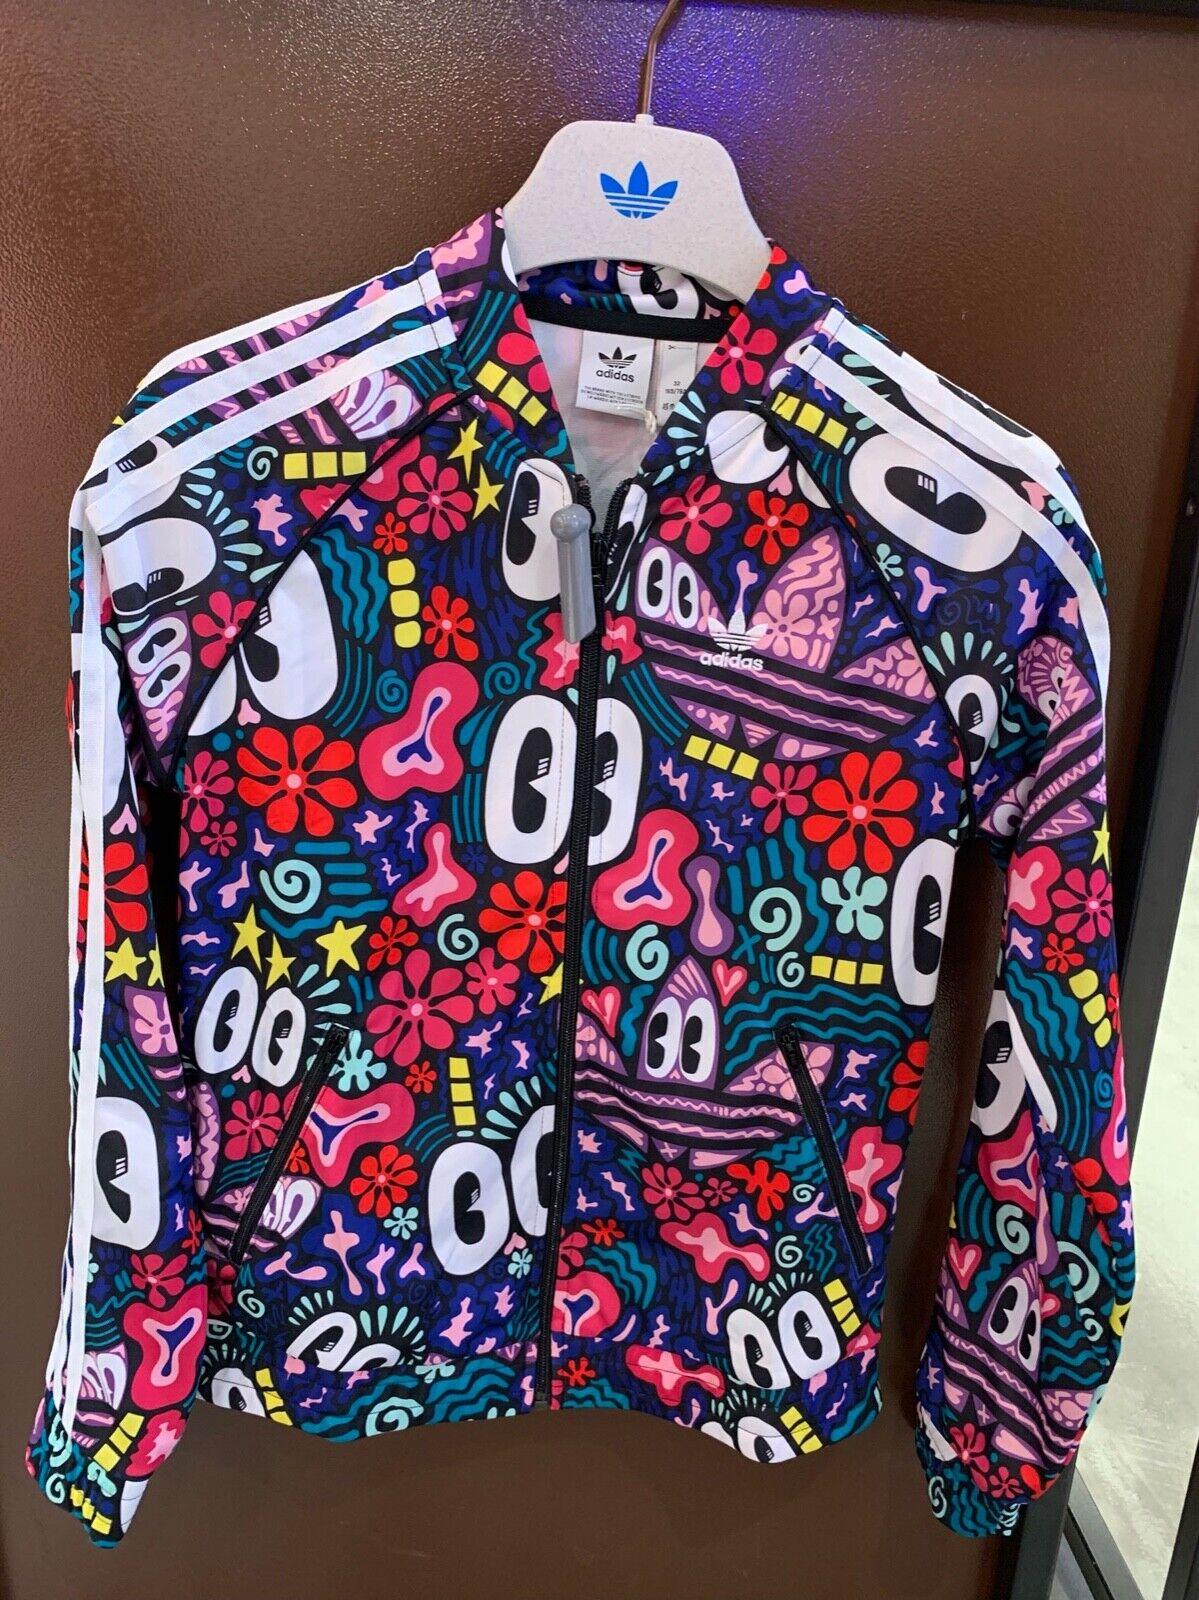 Fortaleza Curiosidad Color rosa  Adidas Originals Women's HATTIE STEWART Farm Firebird Track Top Jacket Eyes  | eBay